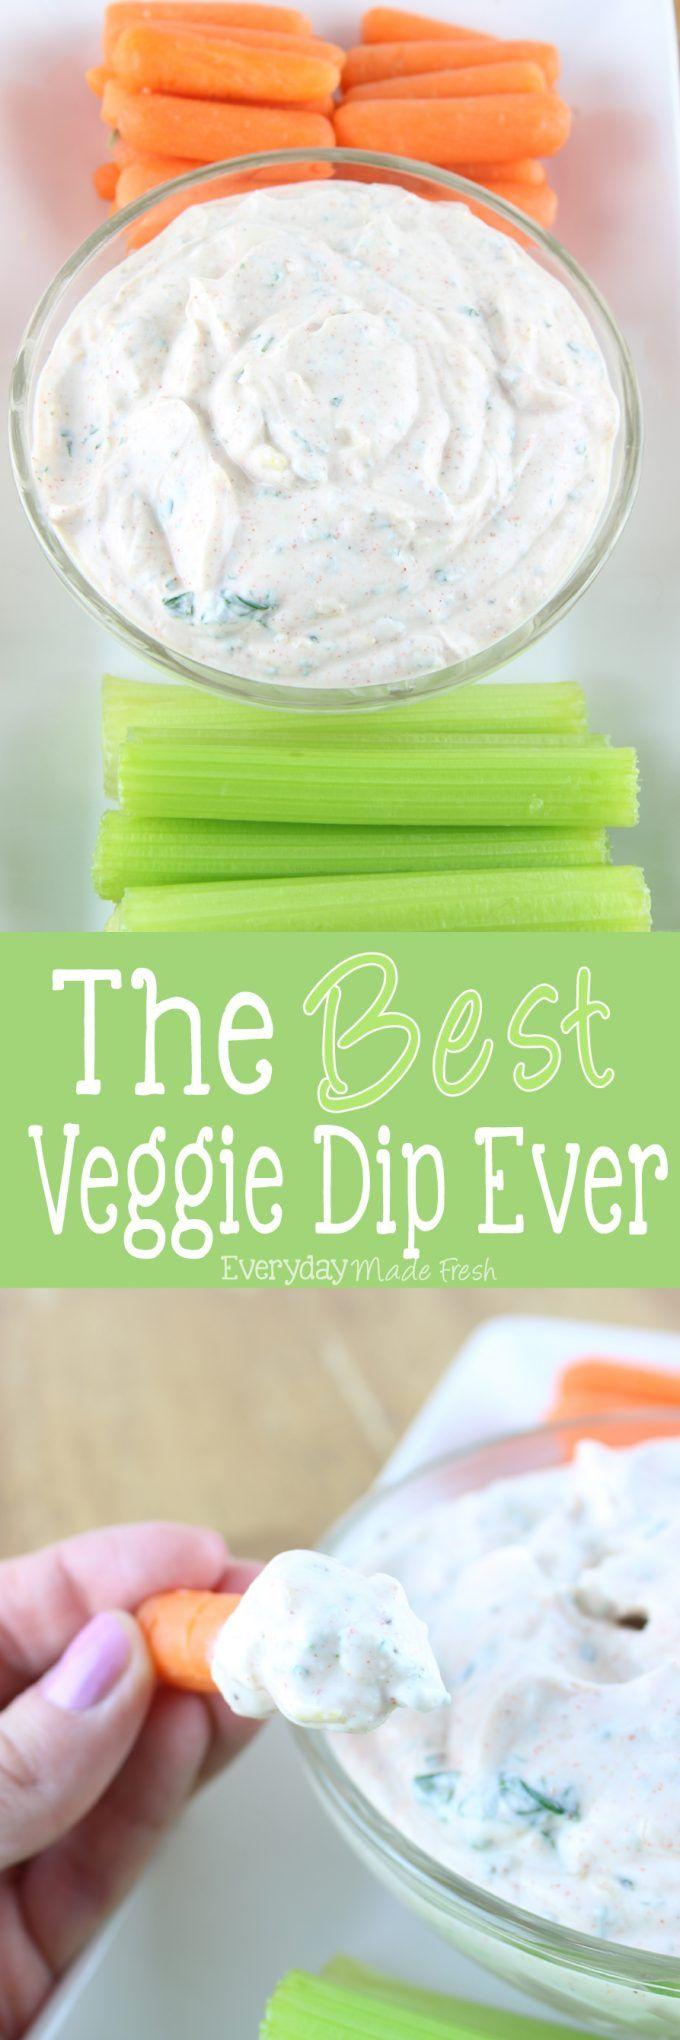 The Best Veggie Dip Ever